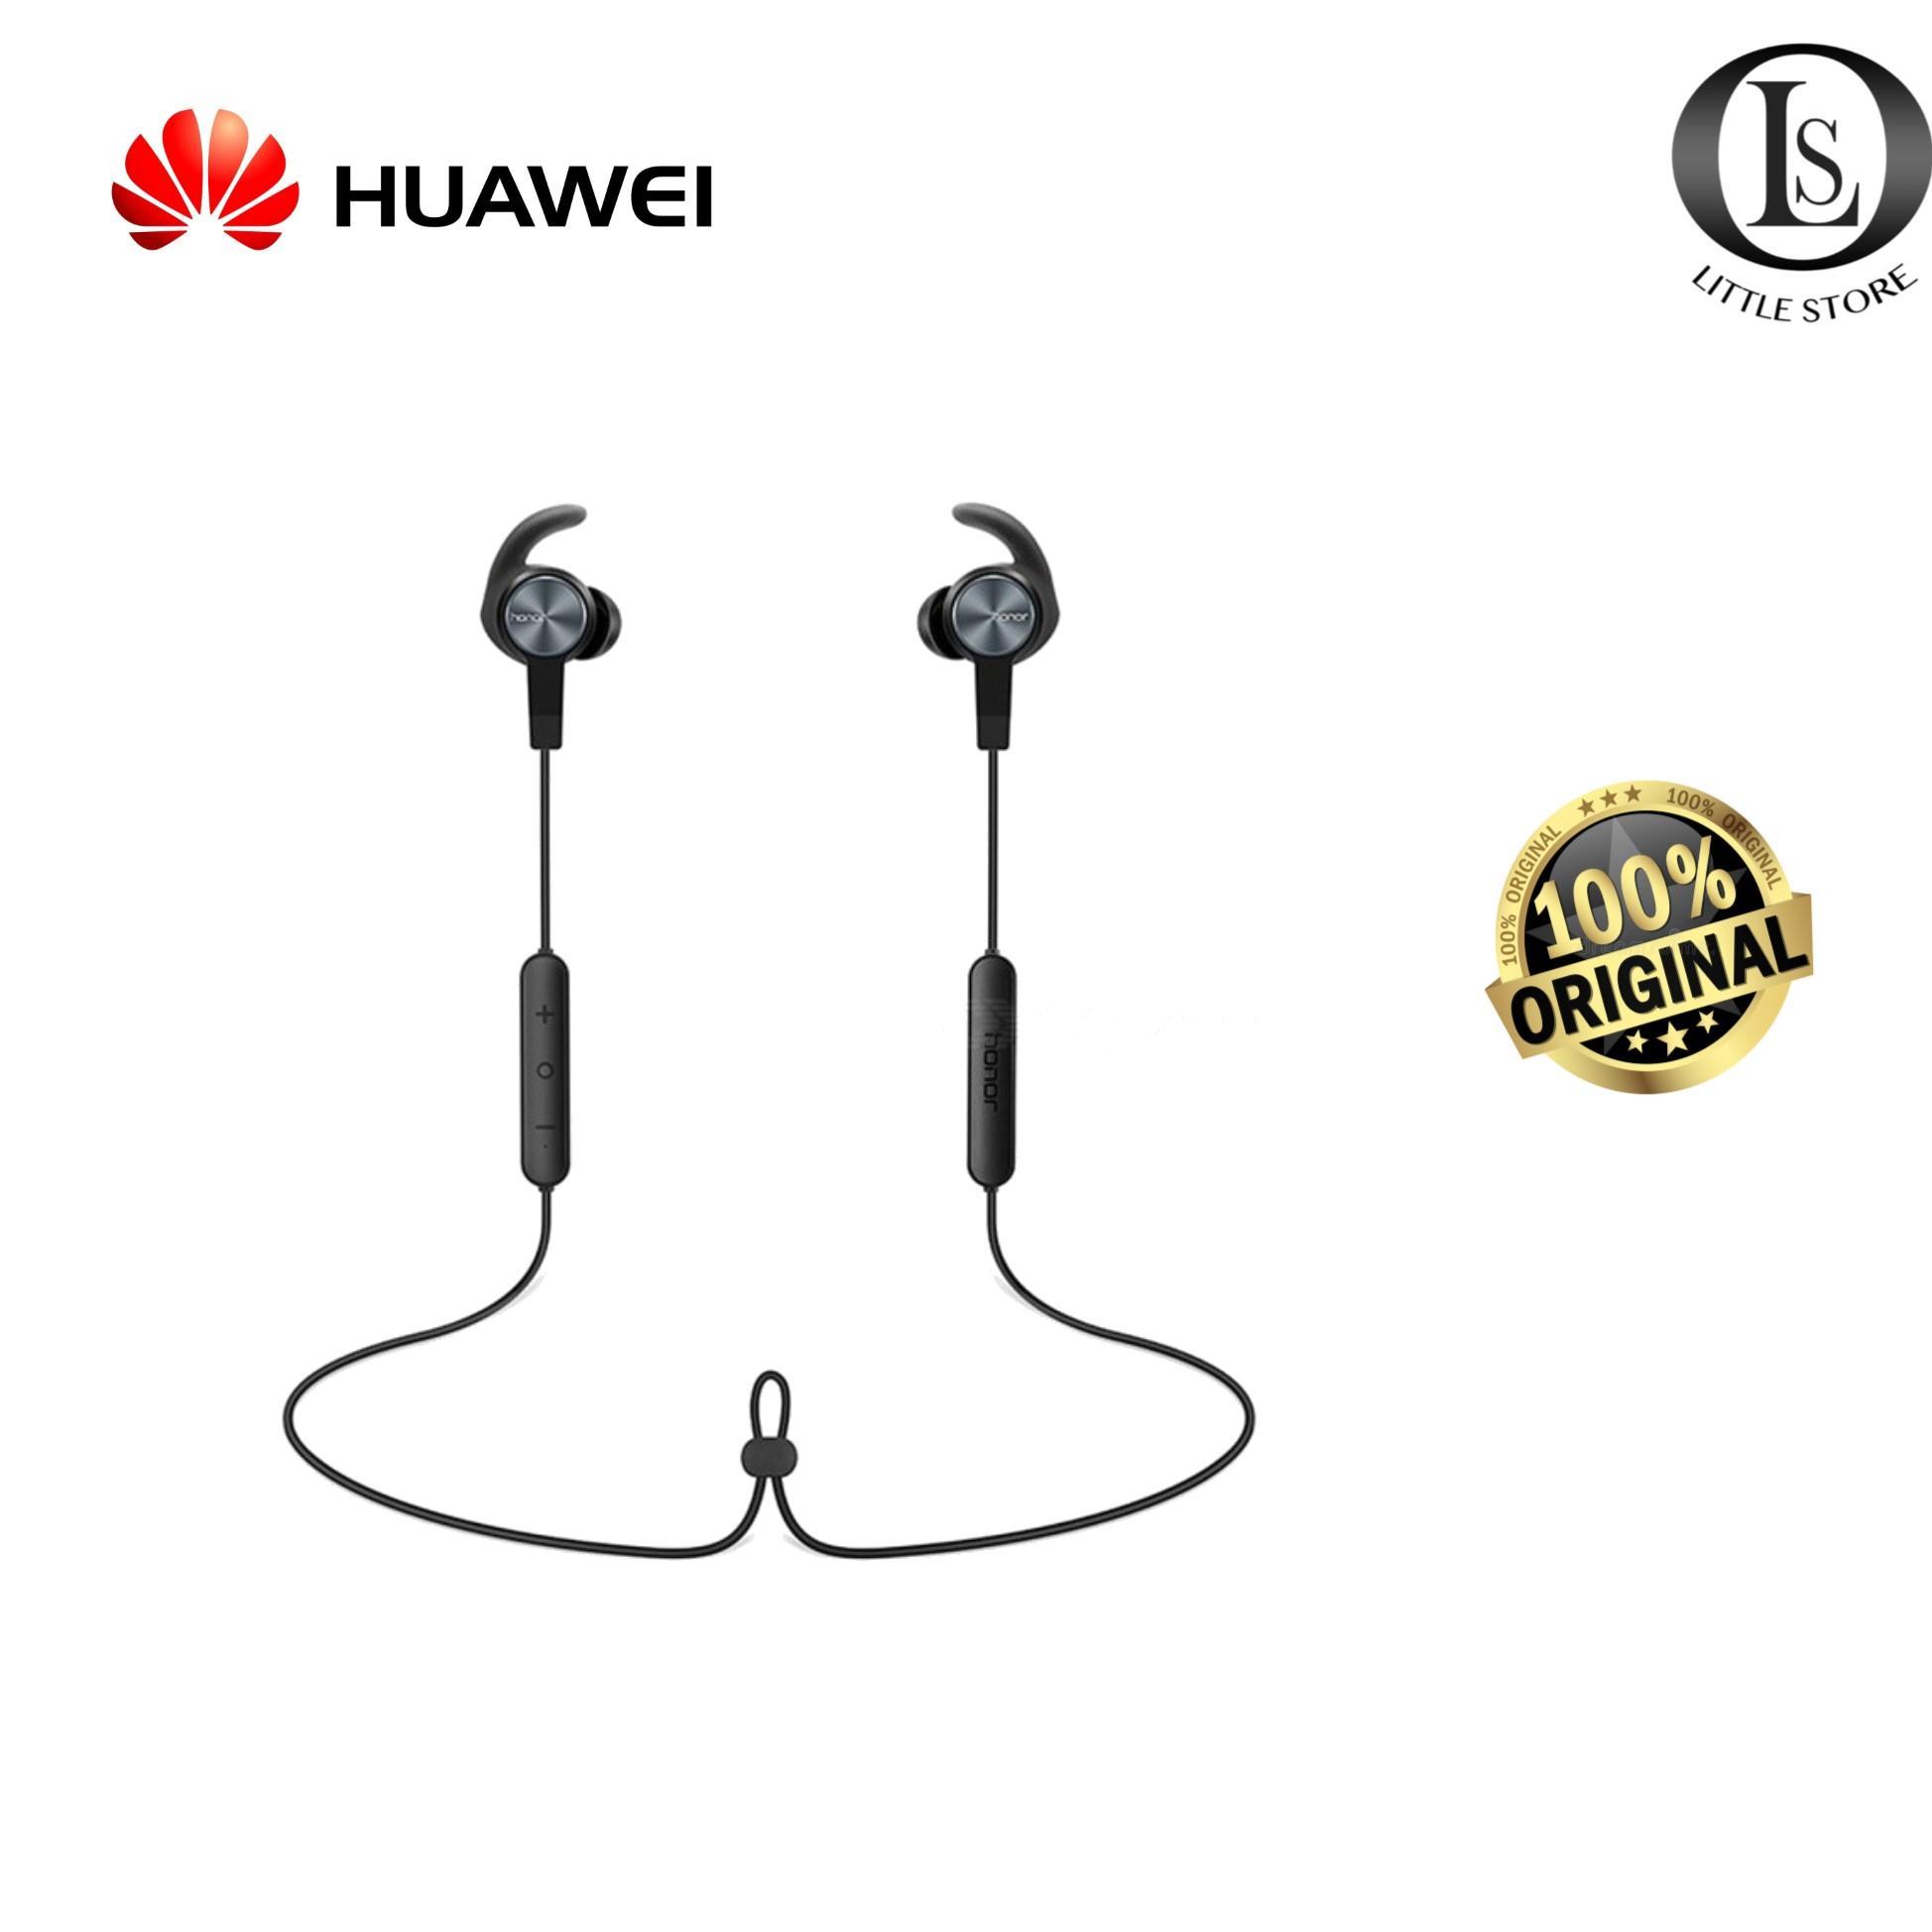 Huawei Sport Bluetooth Headphones AM61, Huawei Malaysia Original Accessories